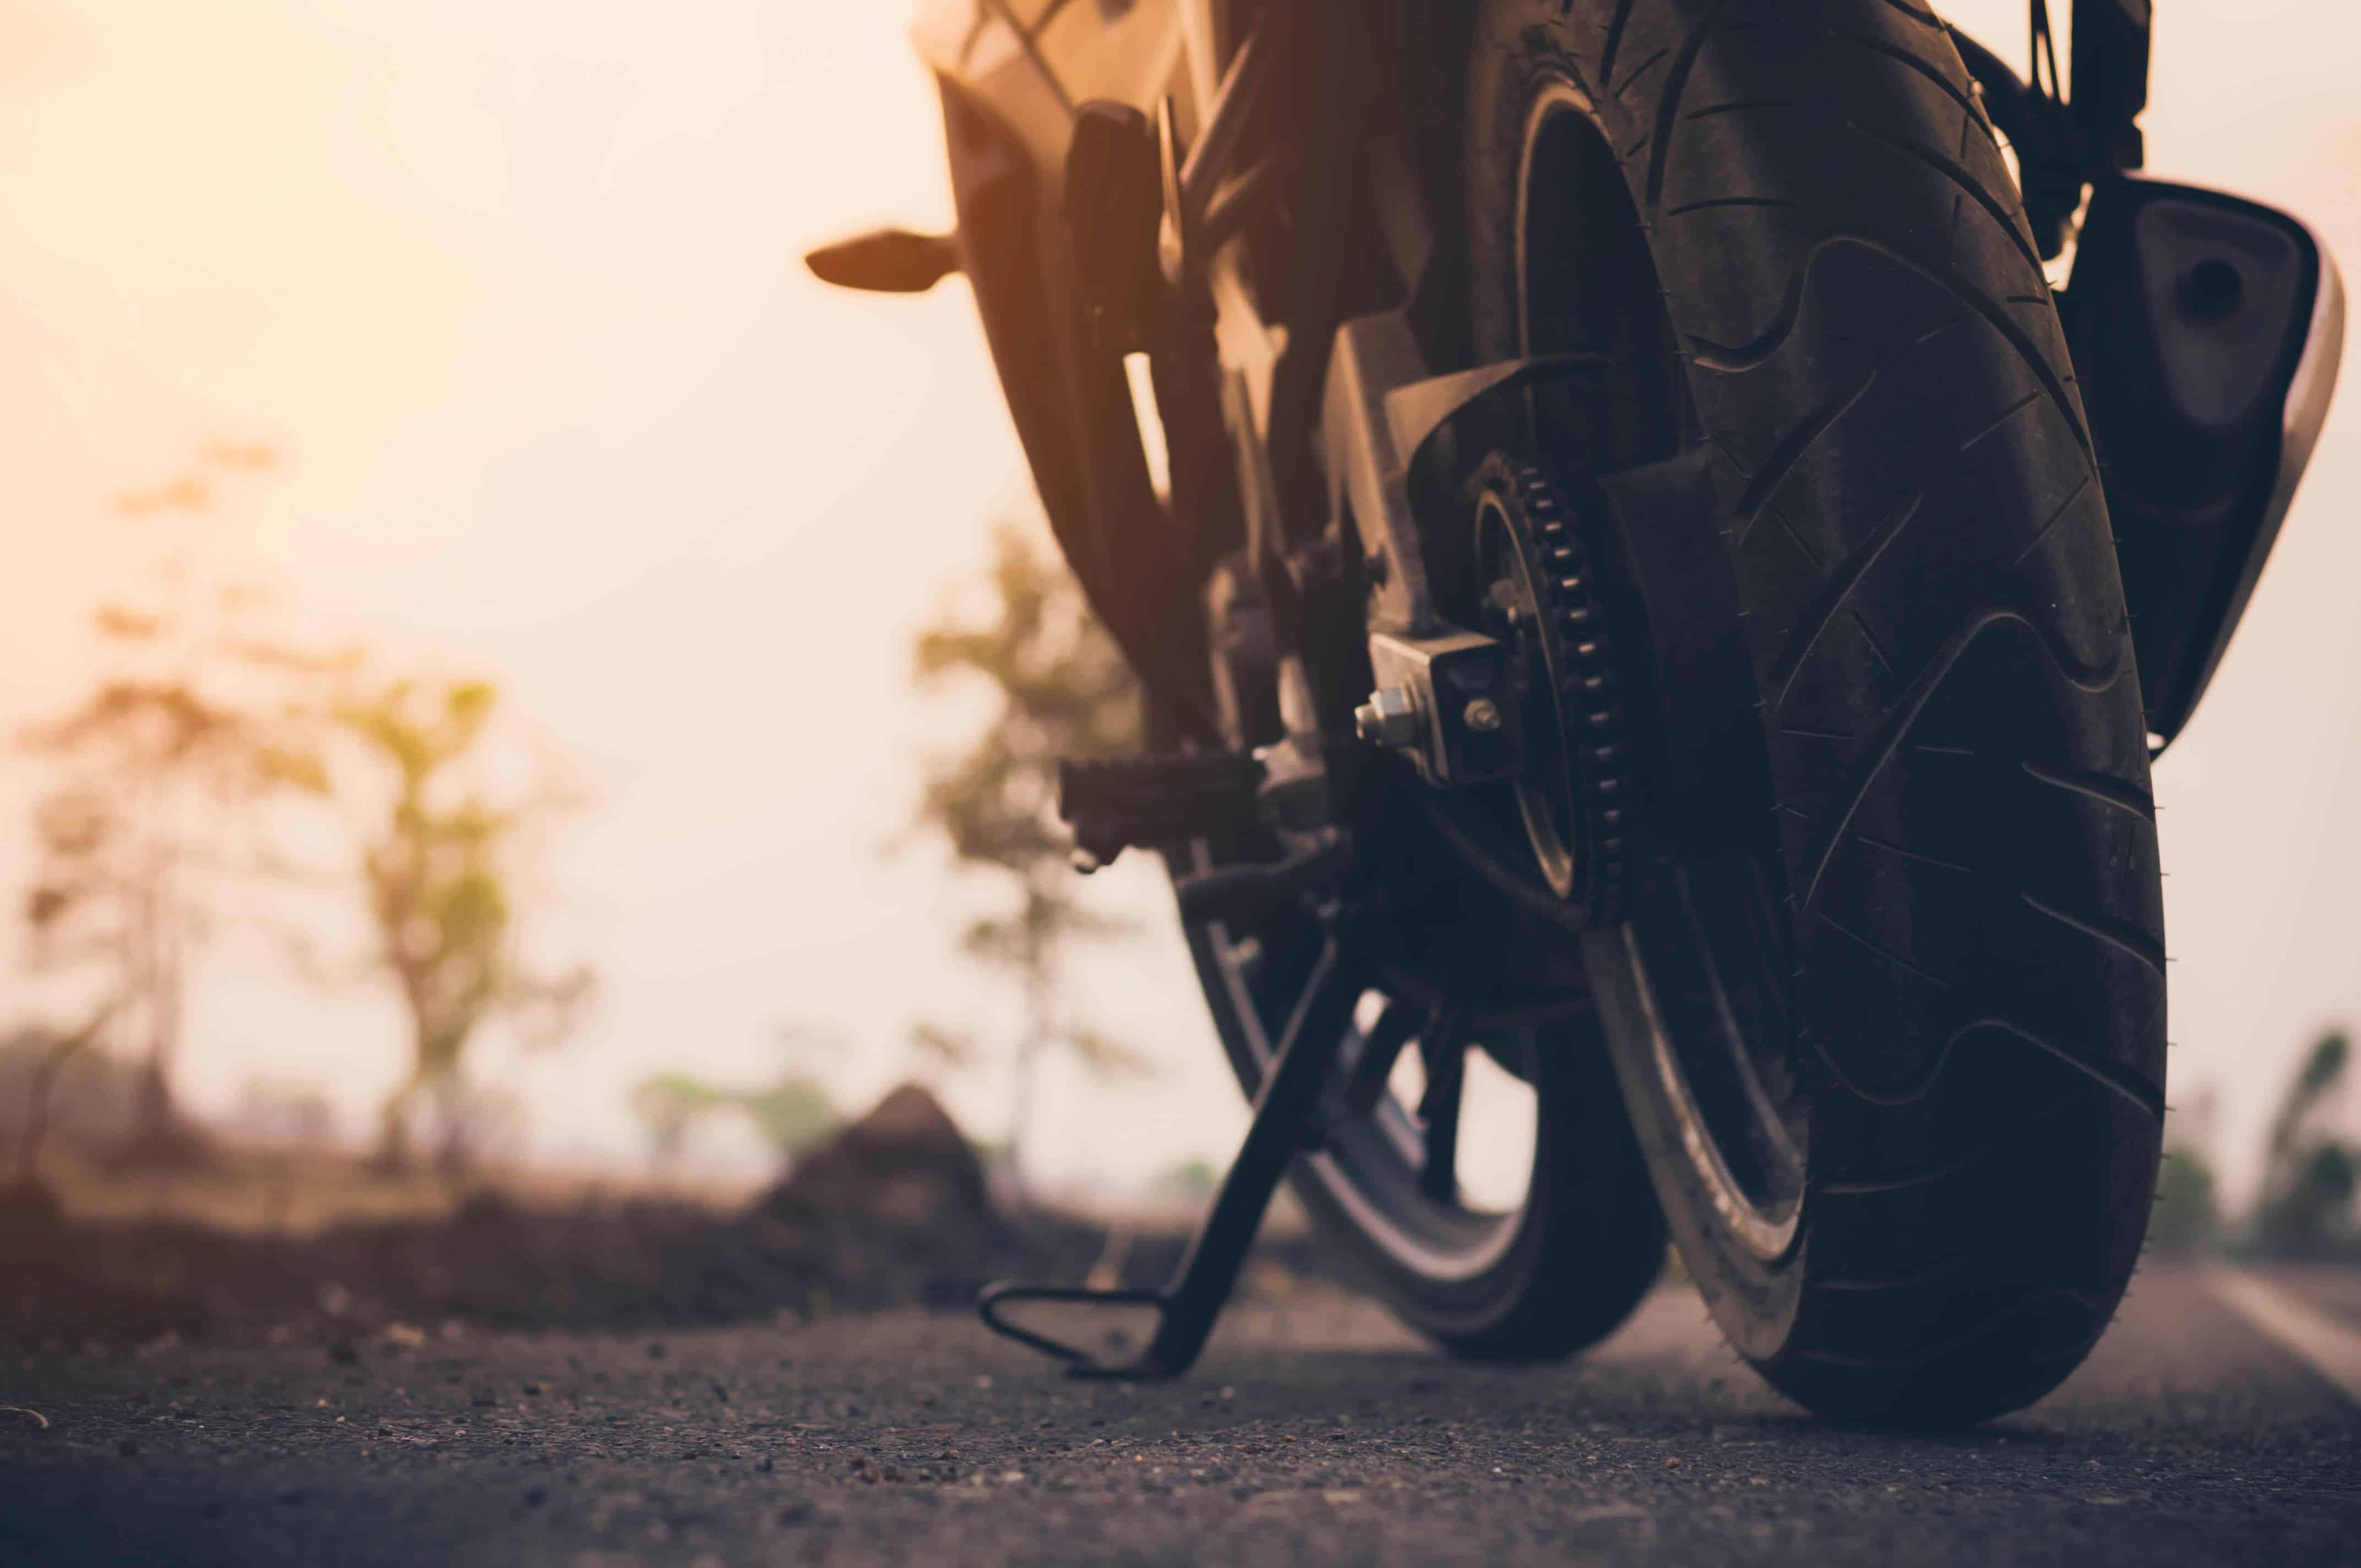 Aaron Barton Killed in Motorcycle Crash on 215 Freeway [PERRIS, CA]